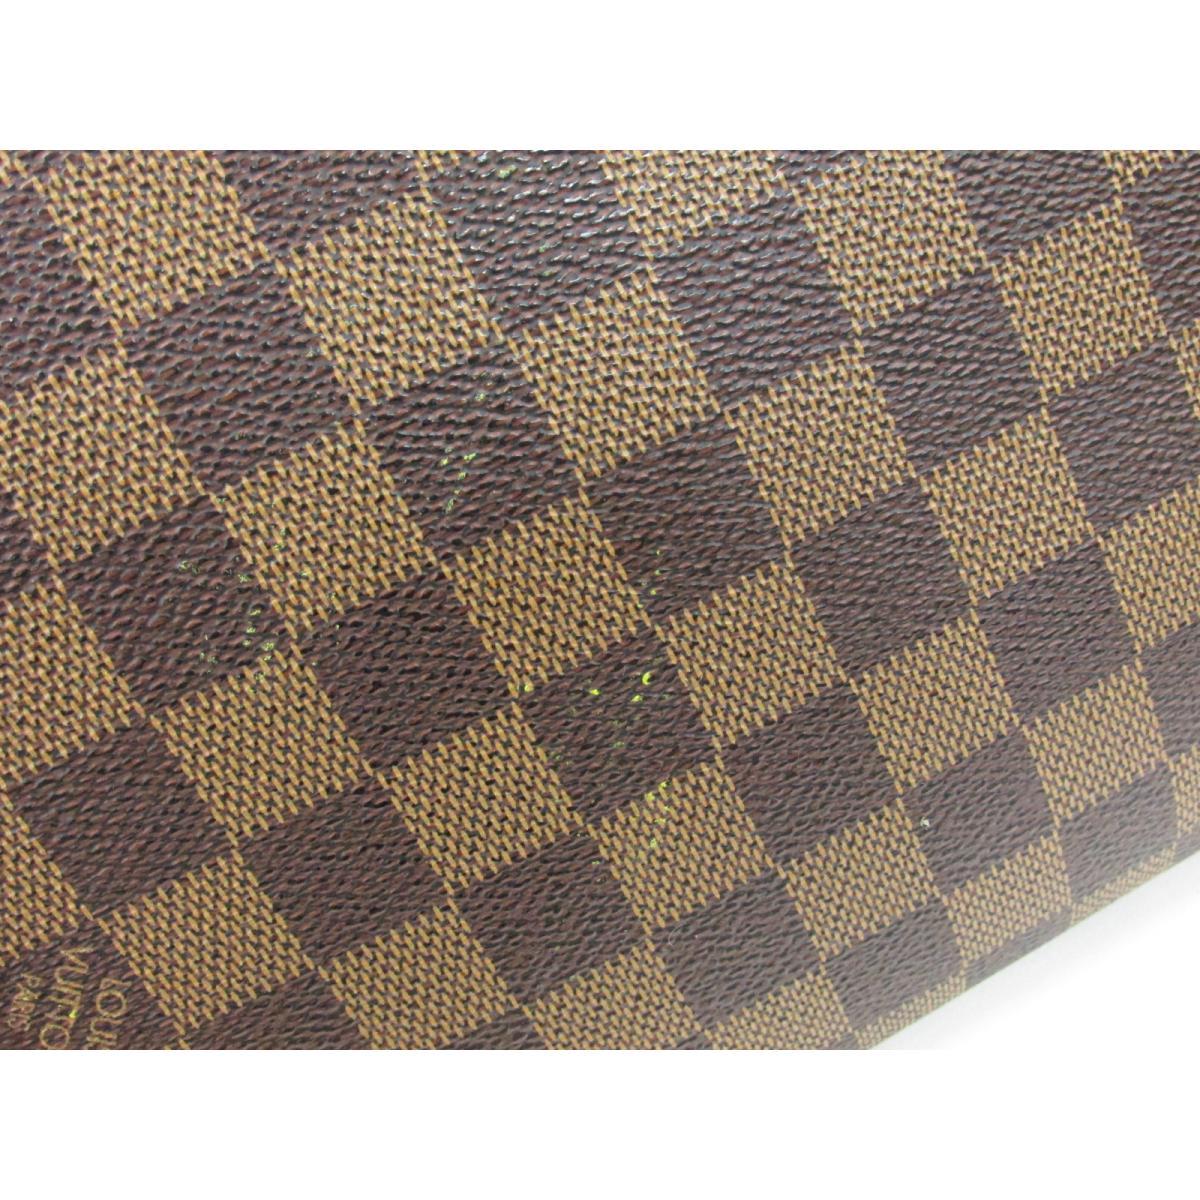 1c21eb298612 (Free shipping) Auth LOUIS VUITTON Saint Louis Clutch Bag N51993 Damier  Used Vintage